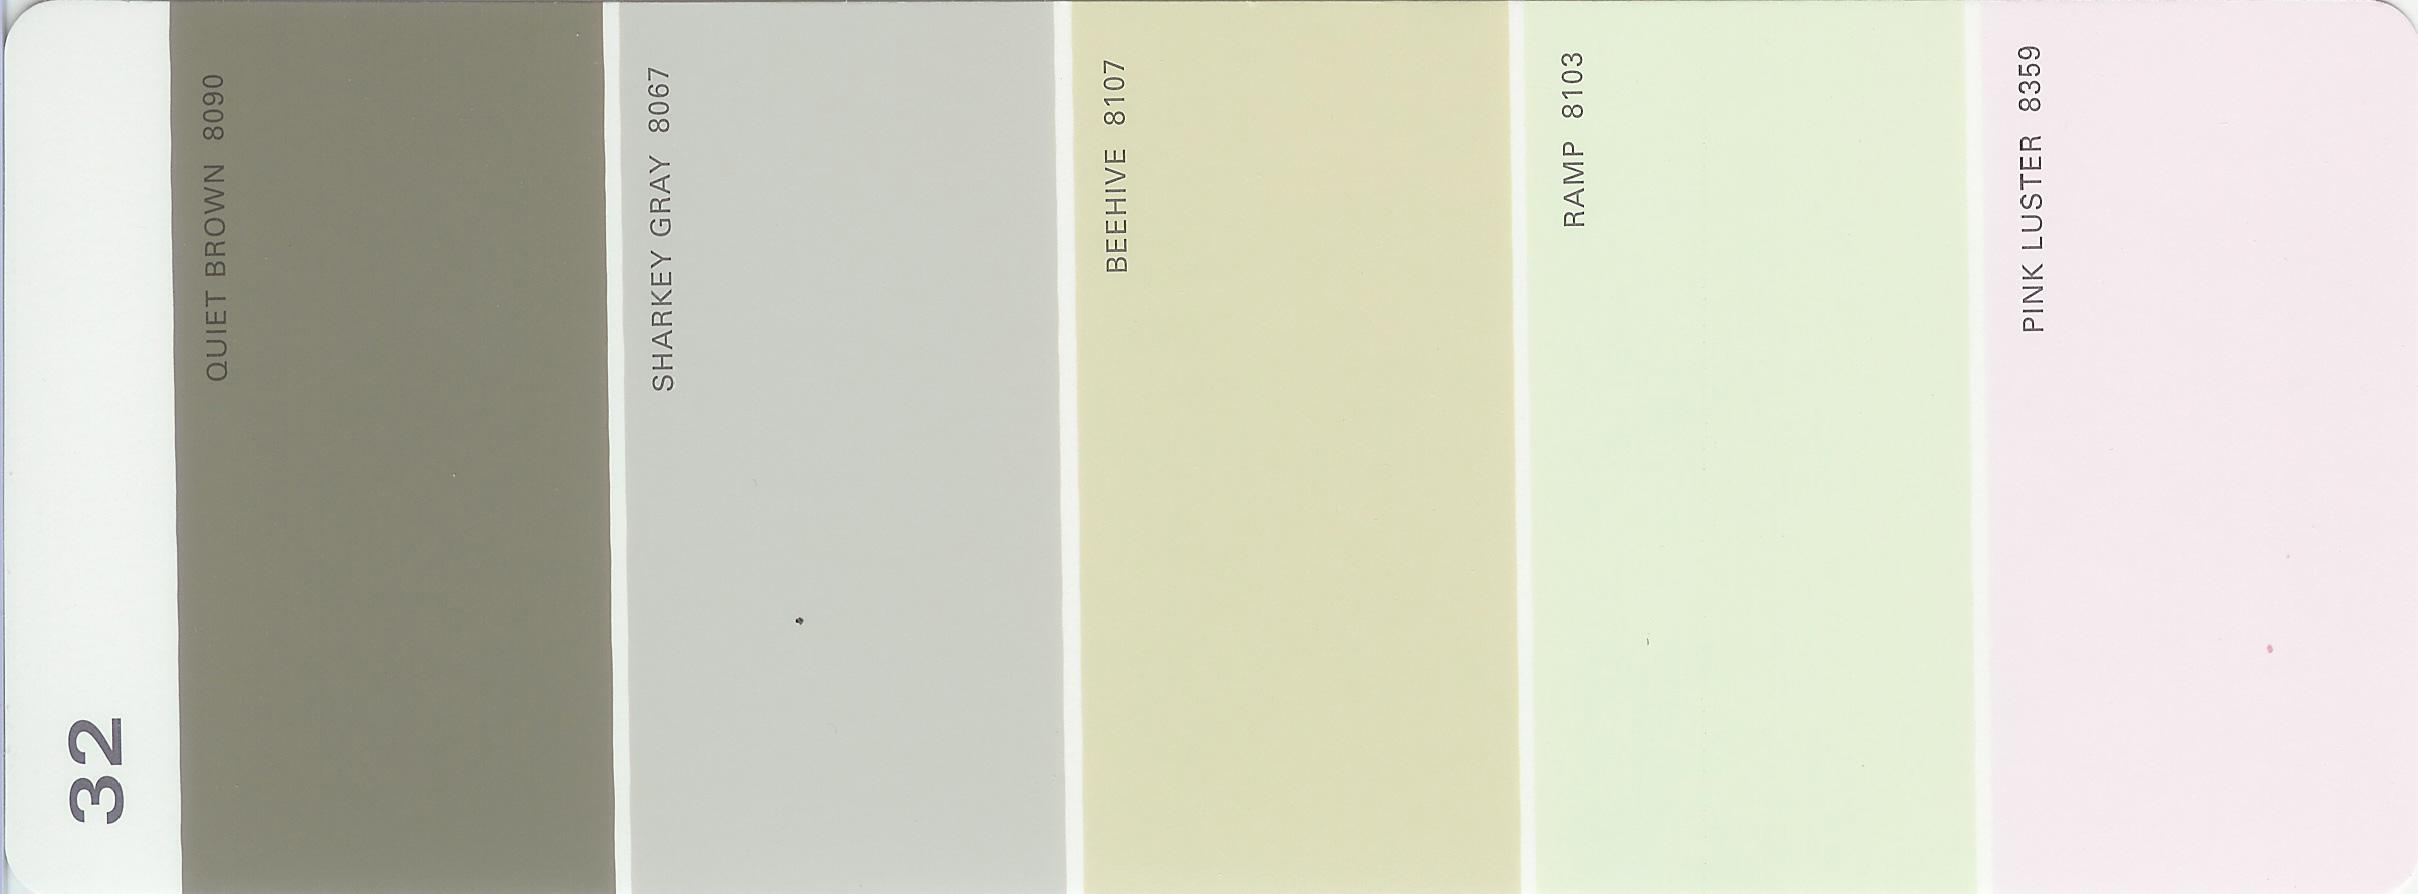 Martha stewart paint 5 color palette card 32 for Martha stewart exterior paint colors